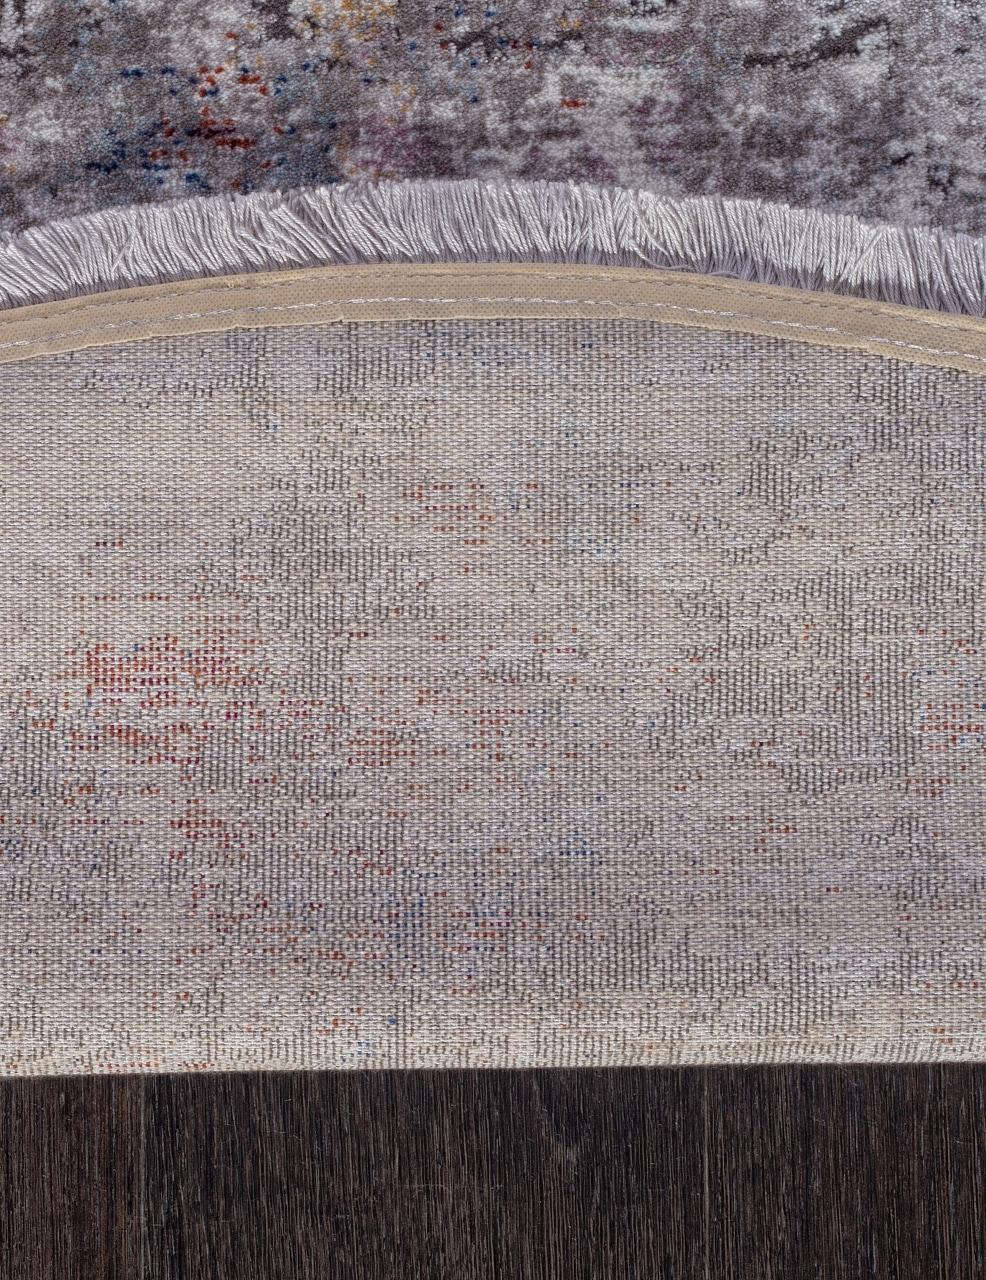 Ковер 05712G - GREY / GREY - Овал - коллекция RIM - фото 5